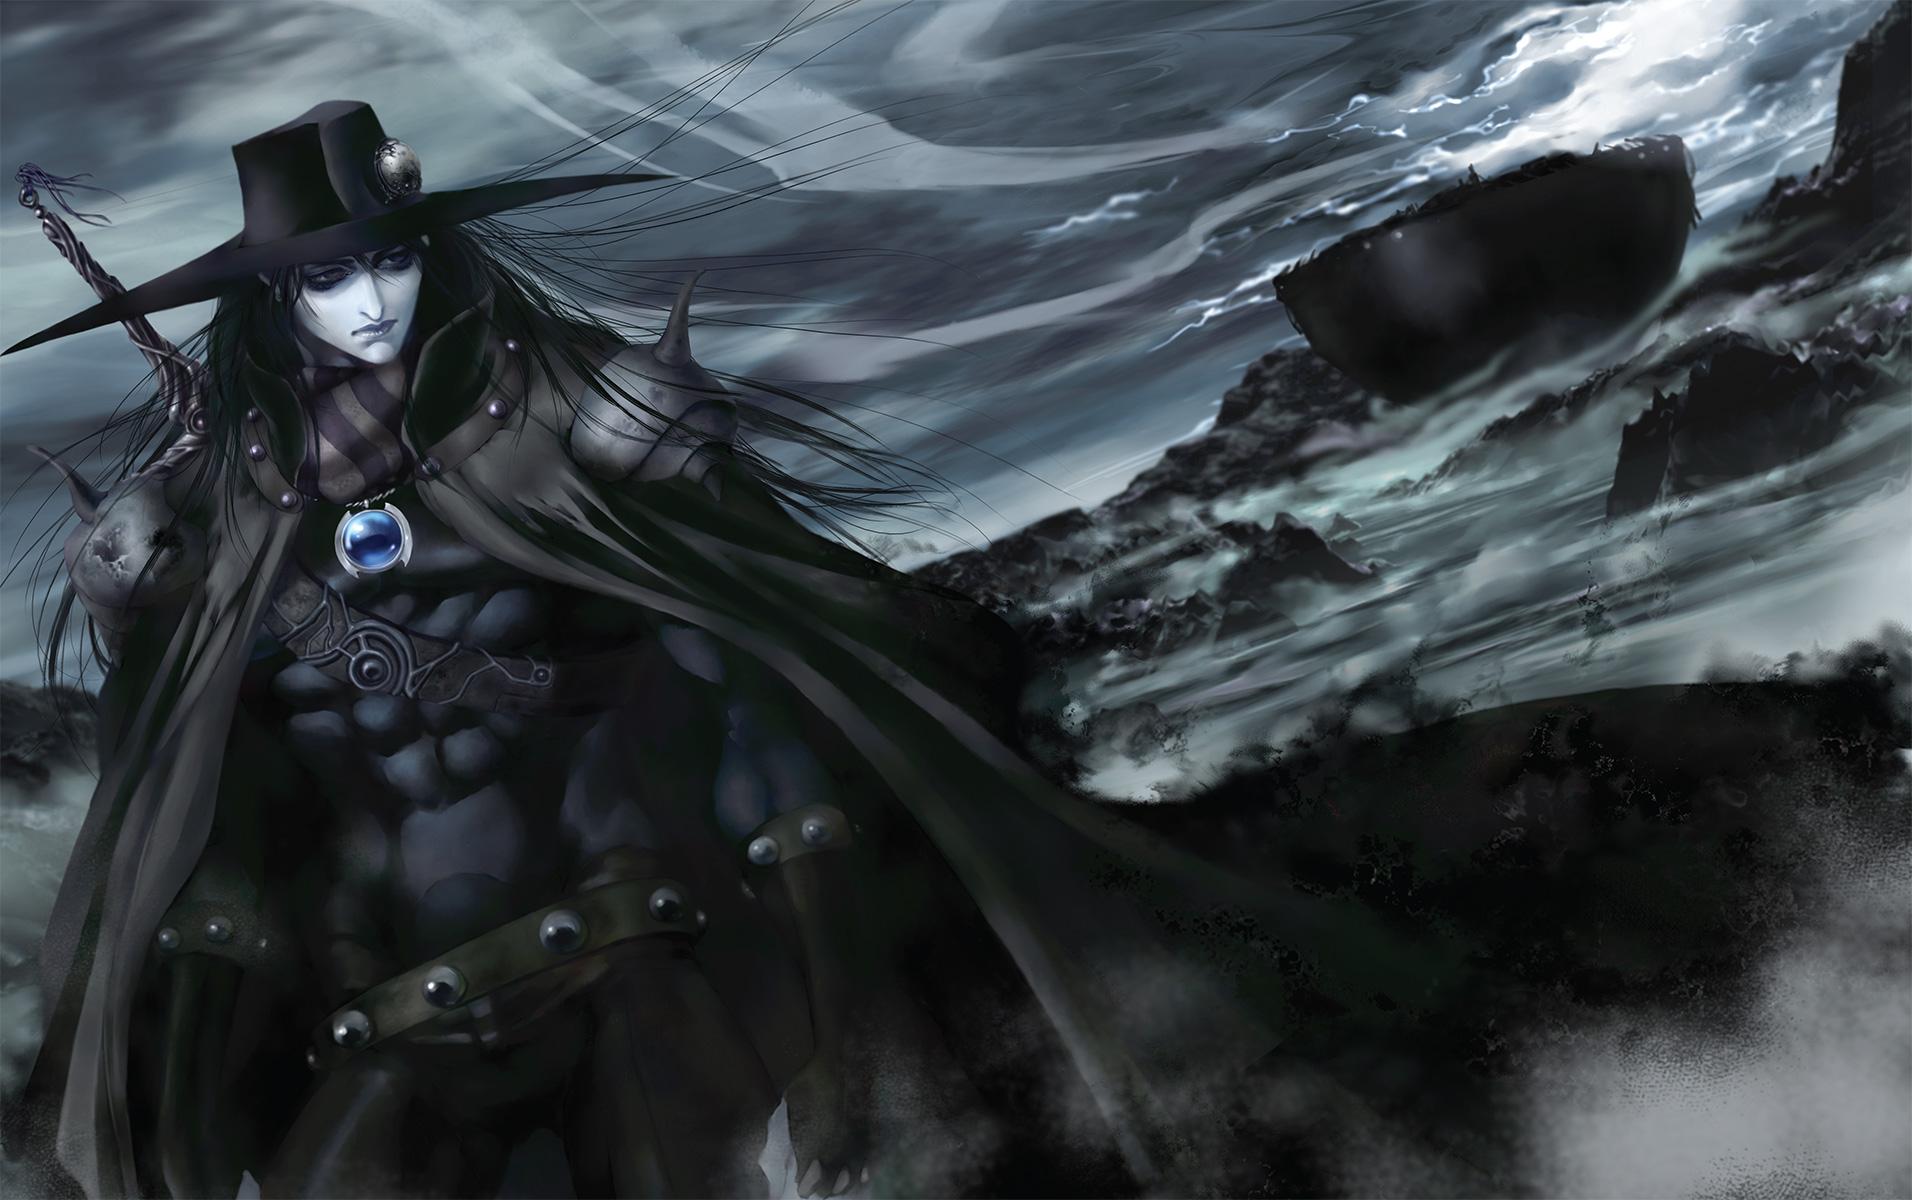 Vampire Hunter Wallpapers Comics Hq Vampire Hunter Pictures 4k